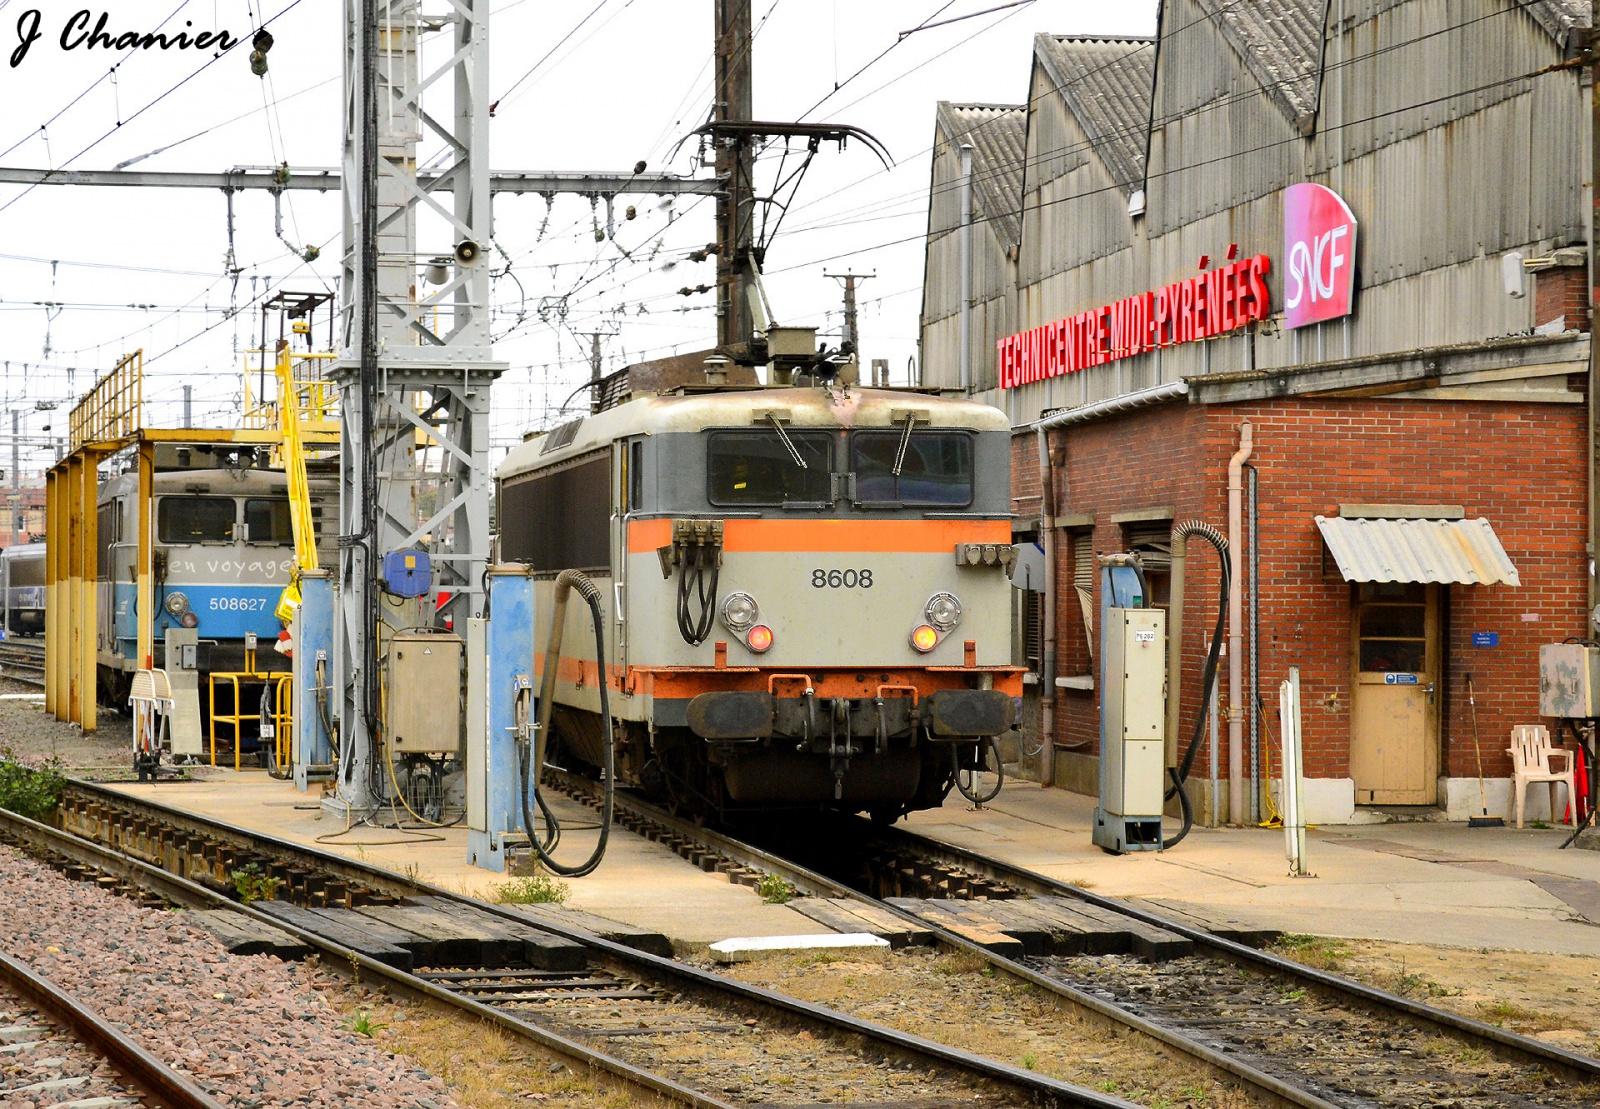 Pk 256,4 : Gare de Toulouse Matabiau (31) - Page 6 406041BB8608TECHNICENTREMPDEPOTTEMATDEC11